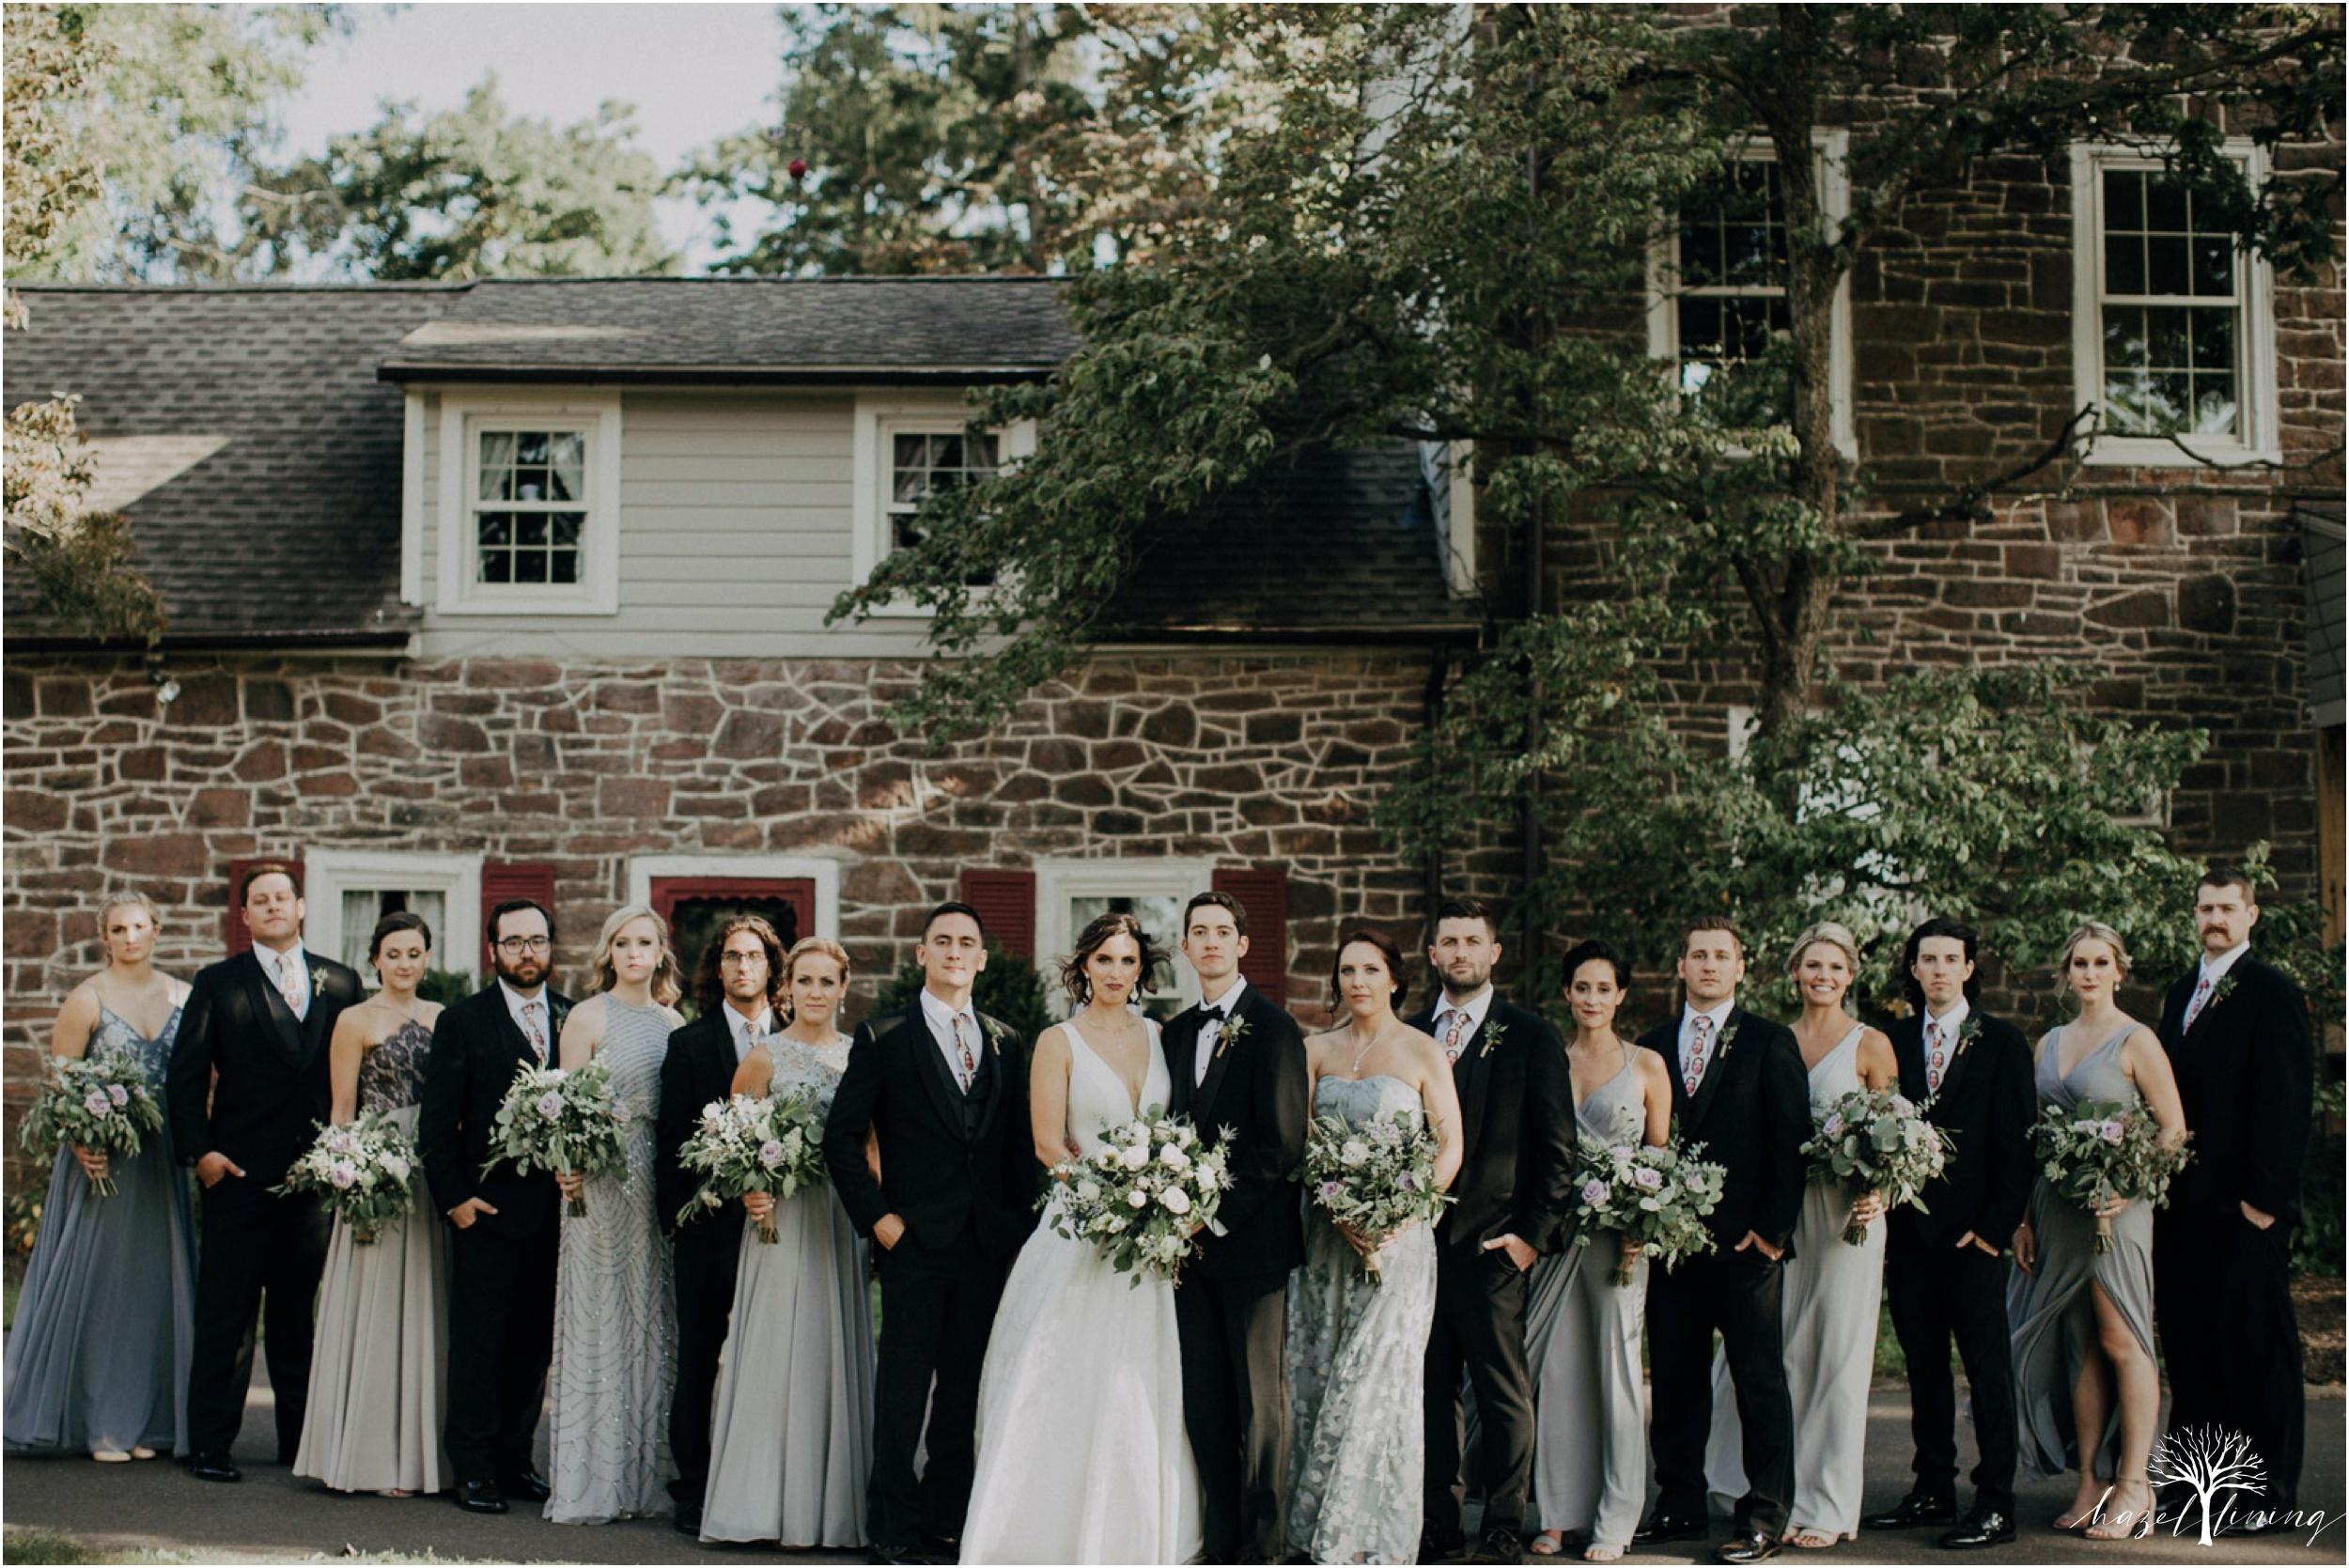 maureen-hepner-anthony-giordano-rose-bank-winery-newtow-pennsylvania-luxury-summer-wedding-hazel-lining-photography-destination-elopement-wedding-engagement-photography_0087.jpg